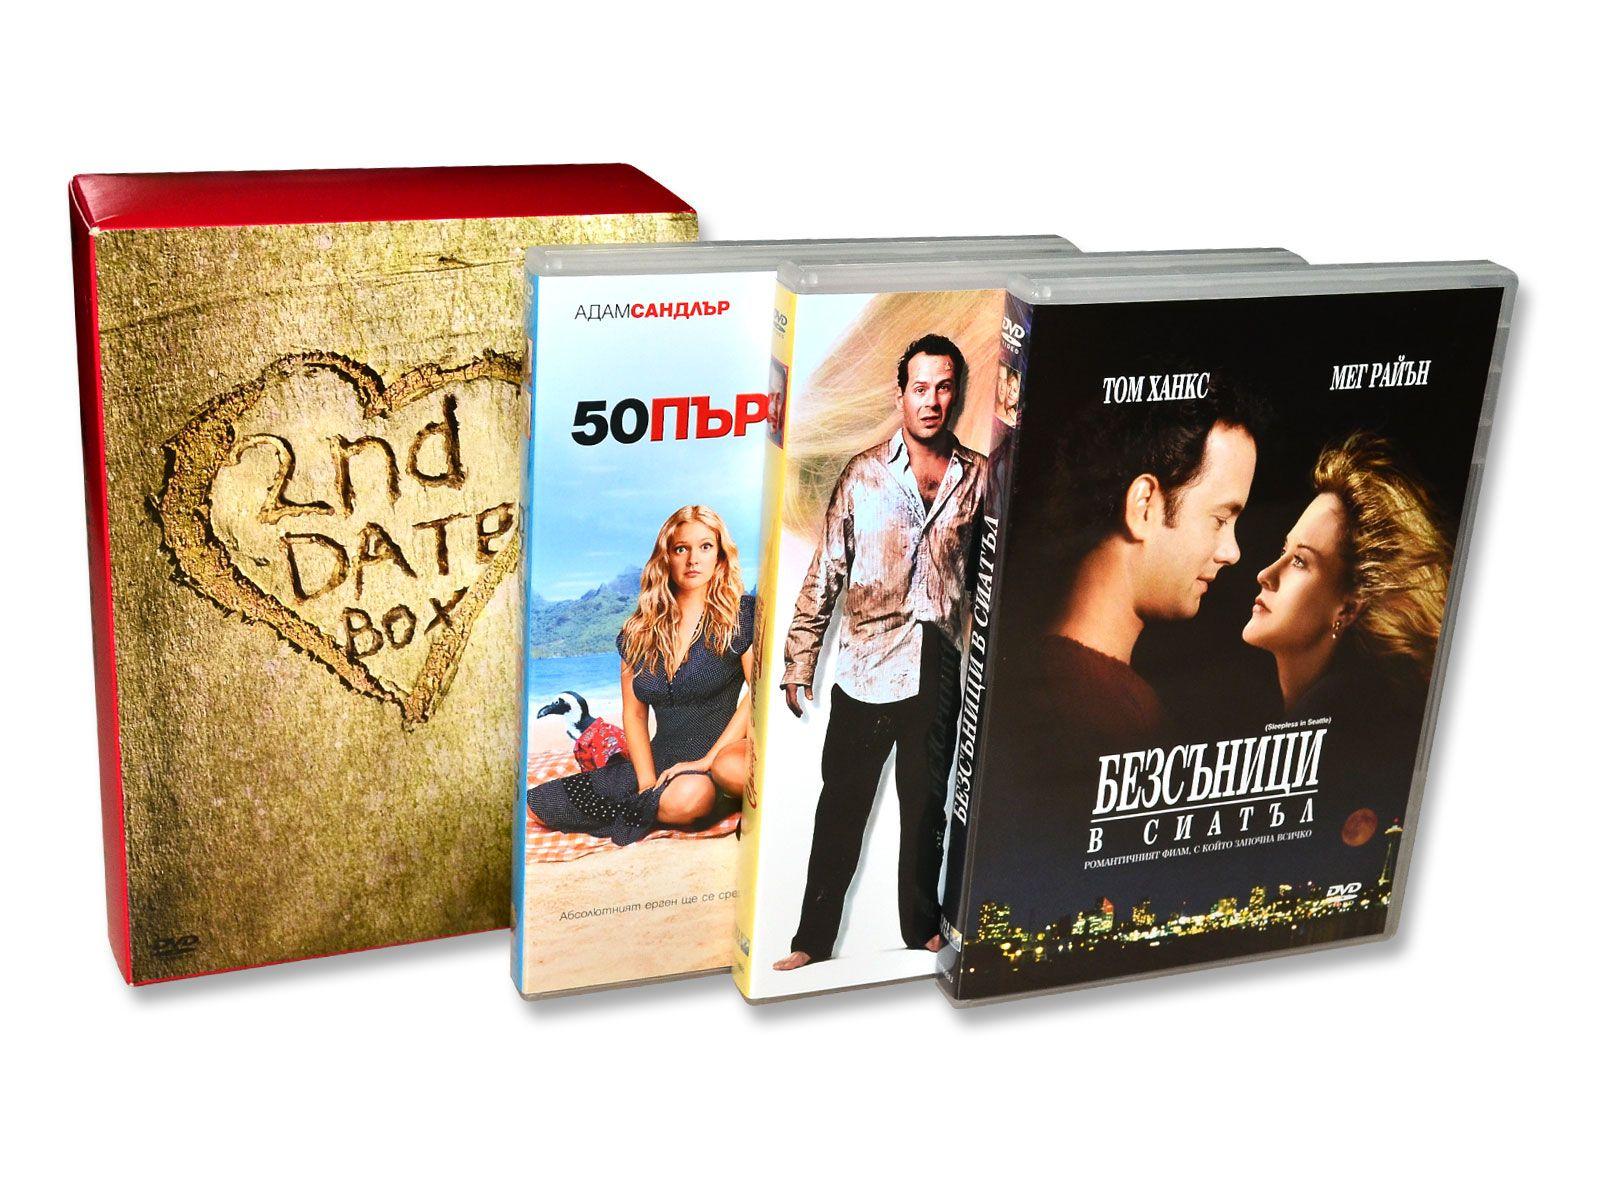 Second Date Box (DVD) - 2